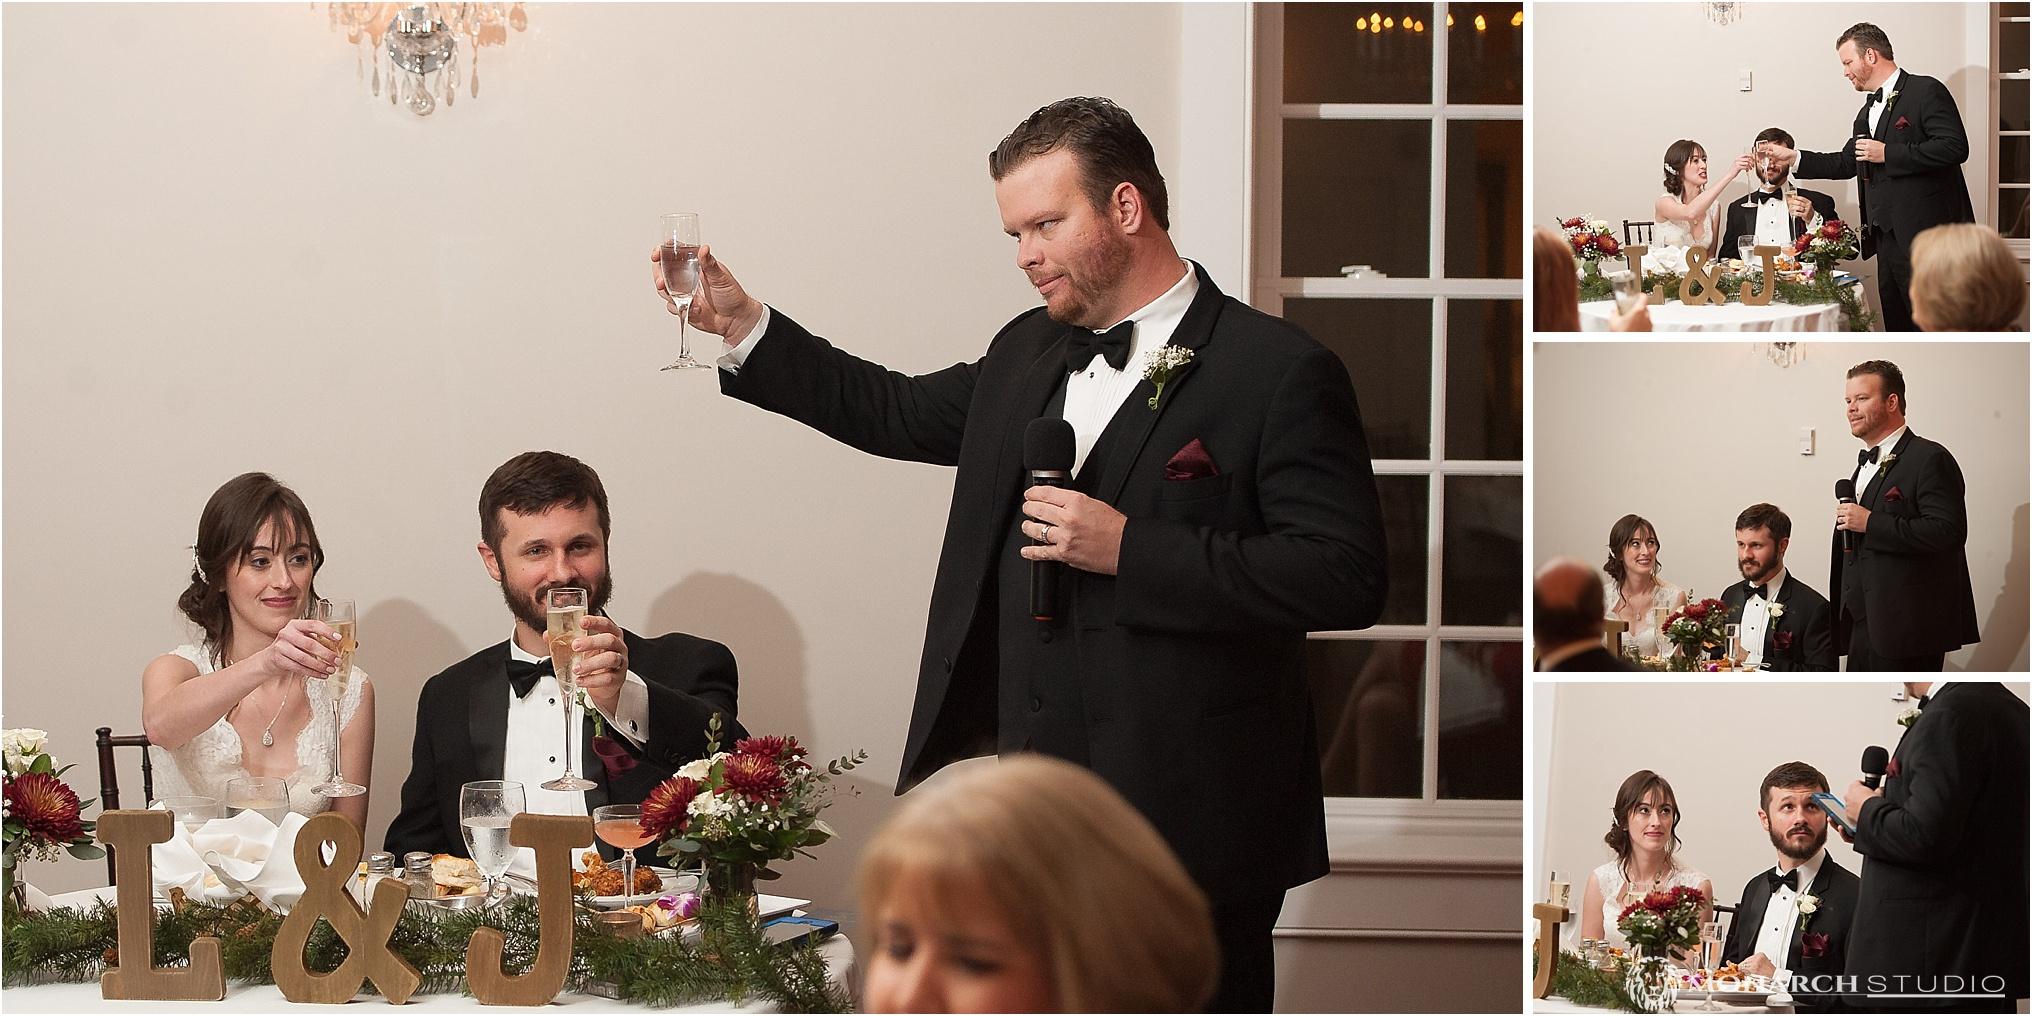 st-augustine-wedding-photographer-white-room-114.jpg